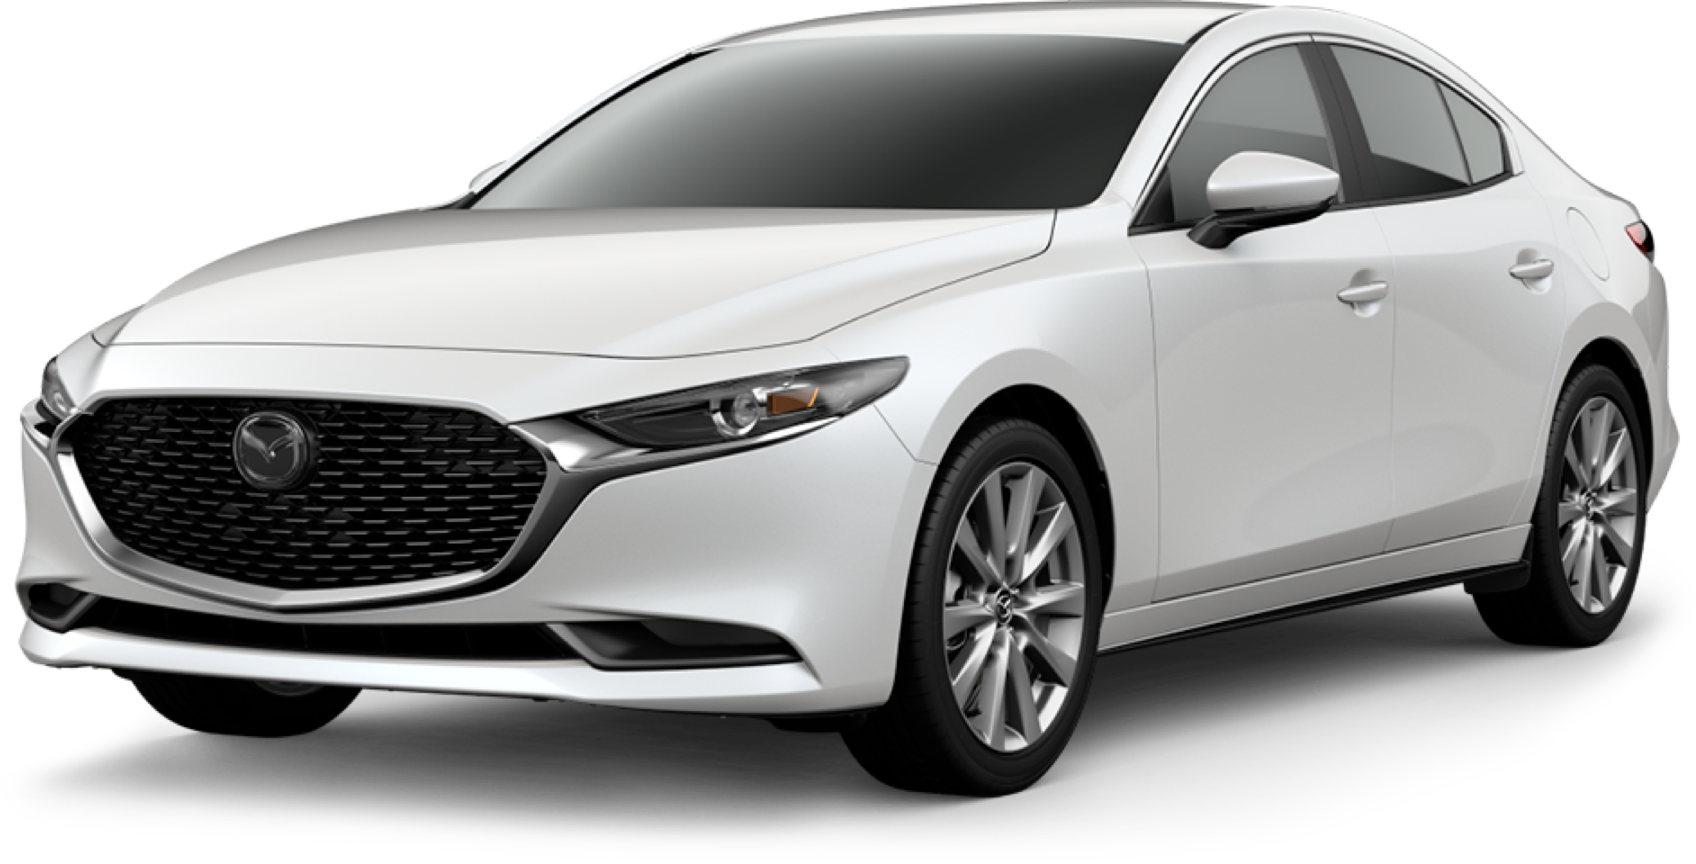 2021 Mazda3 Sedan, Snowflake White Pearl Mica